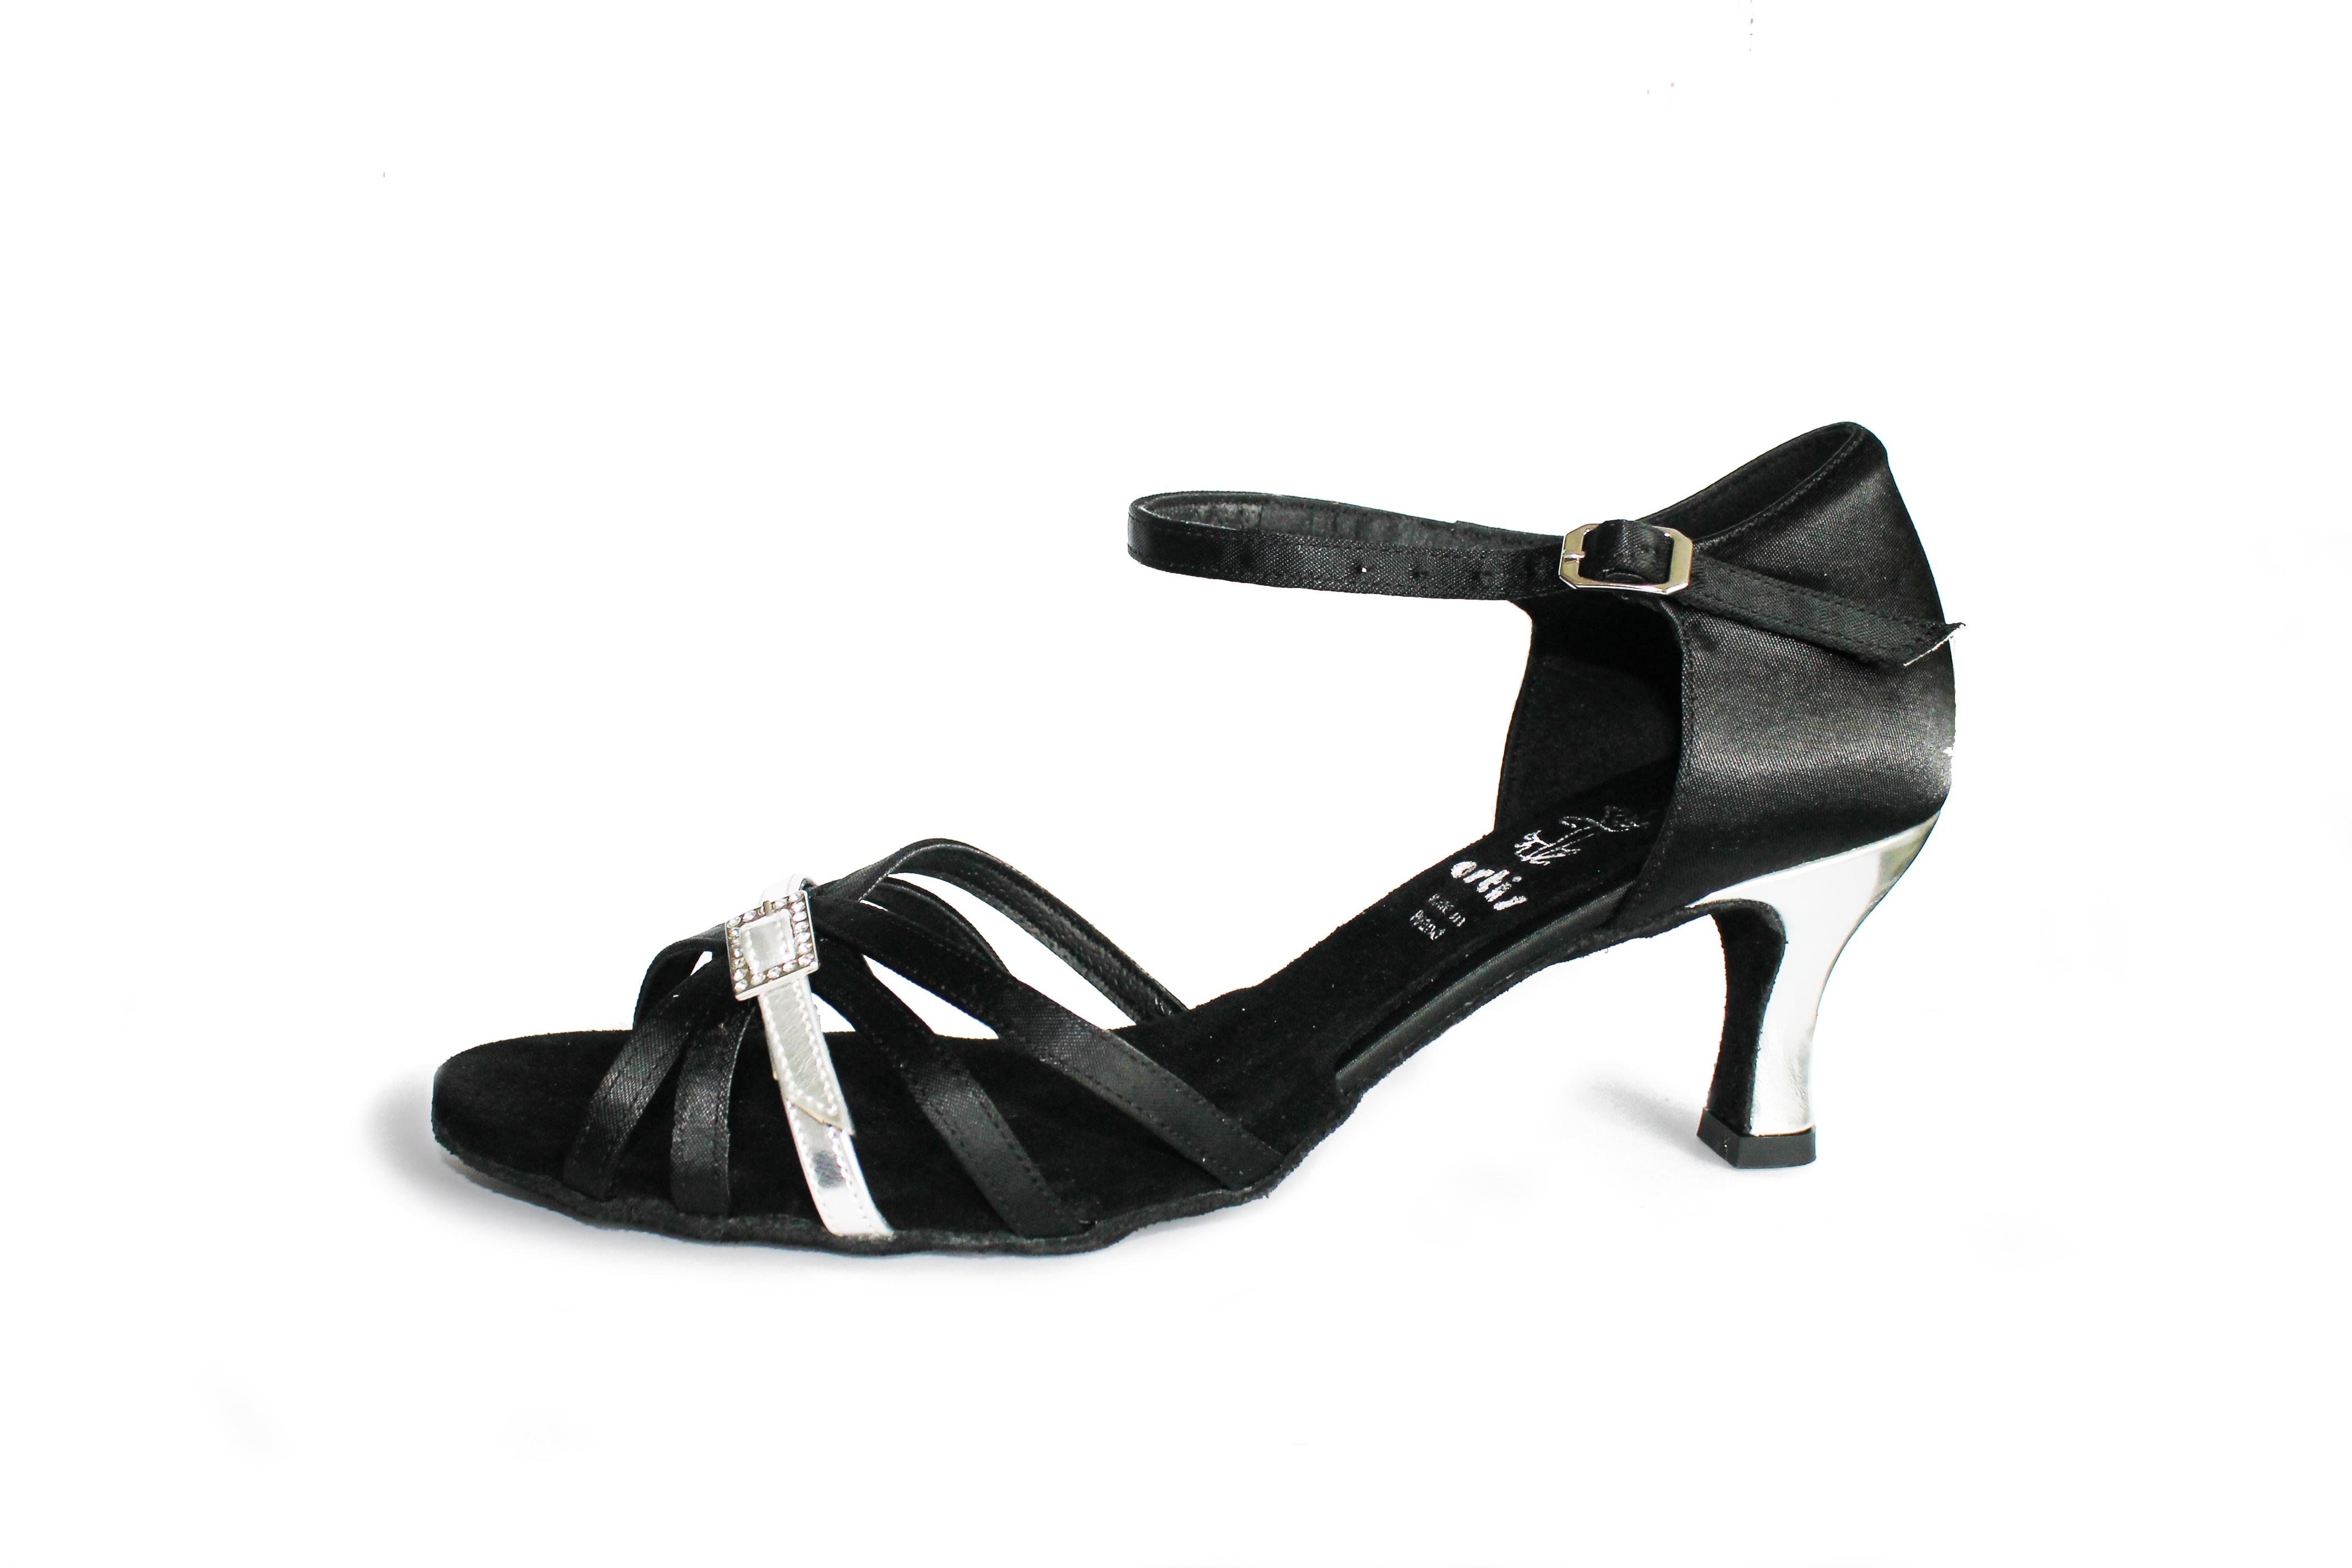 2d1172da5f6f Tanečné topánky ARTIS - DL-34 is 6 cm Flare empty